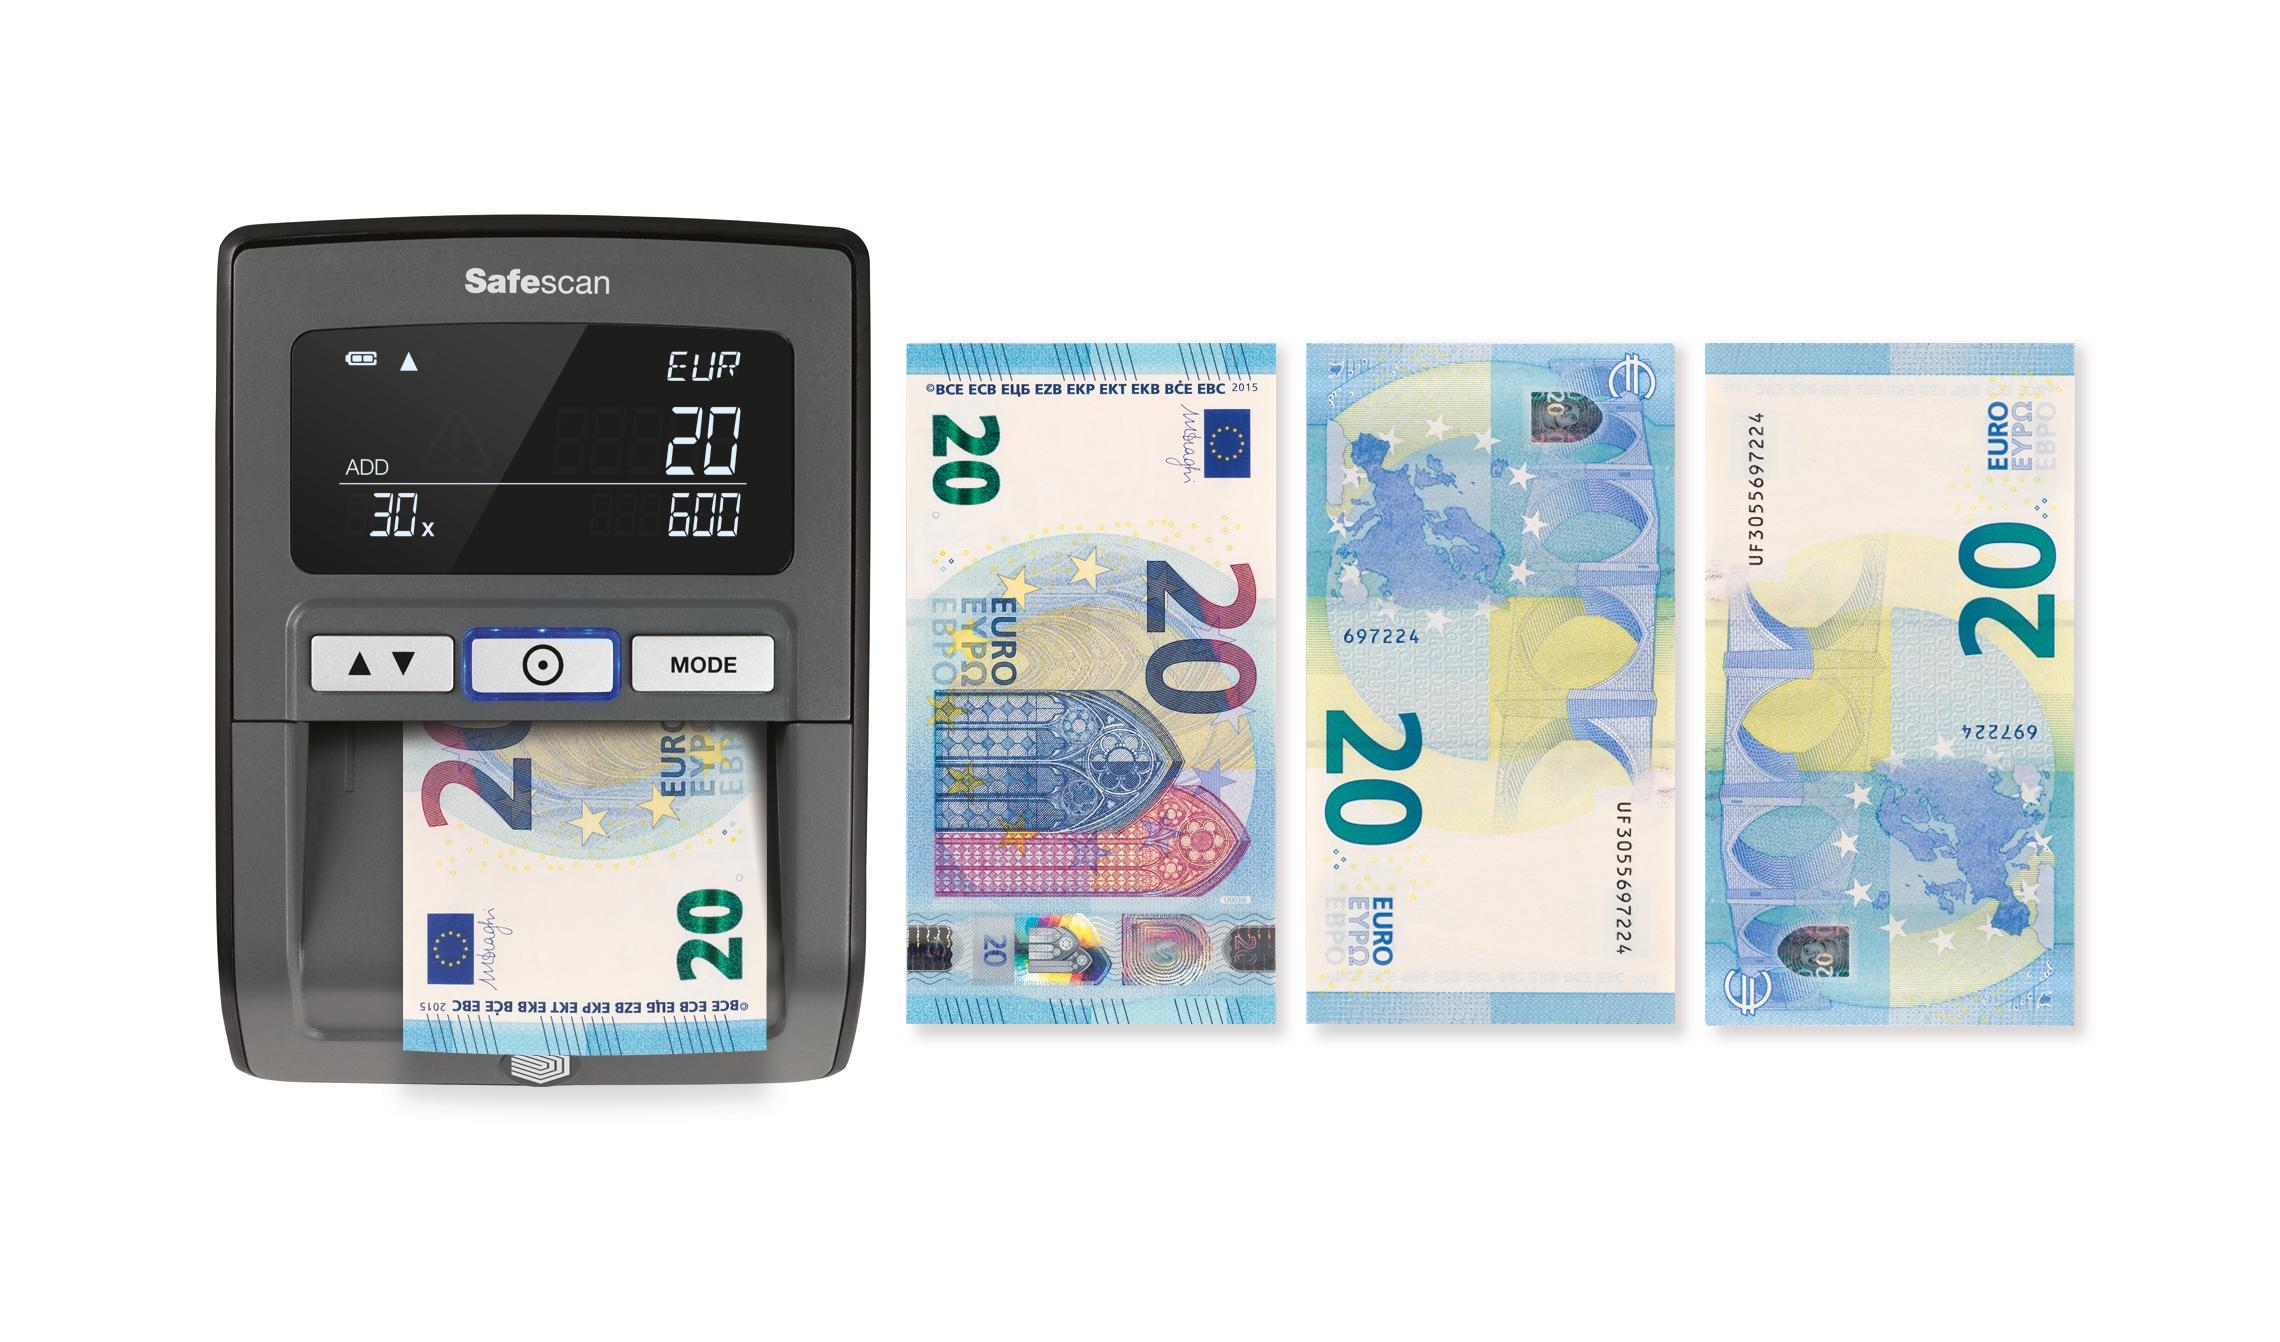 safescan-155i-schwarz-euro-testen